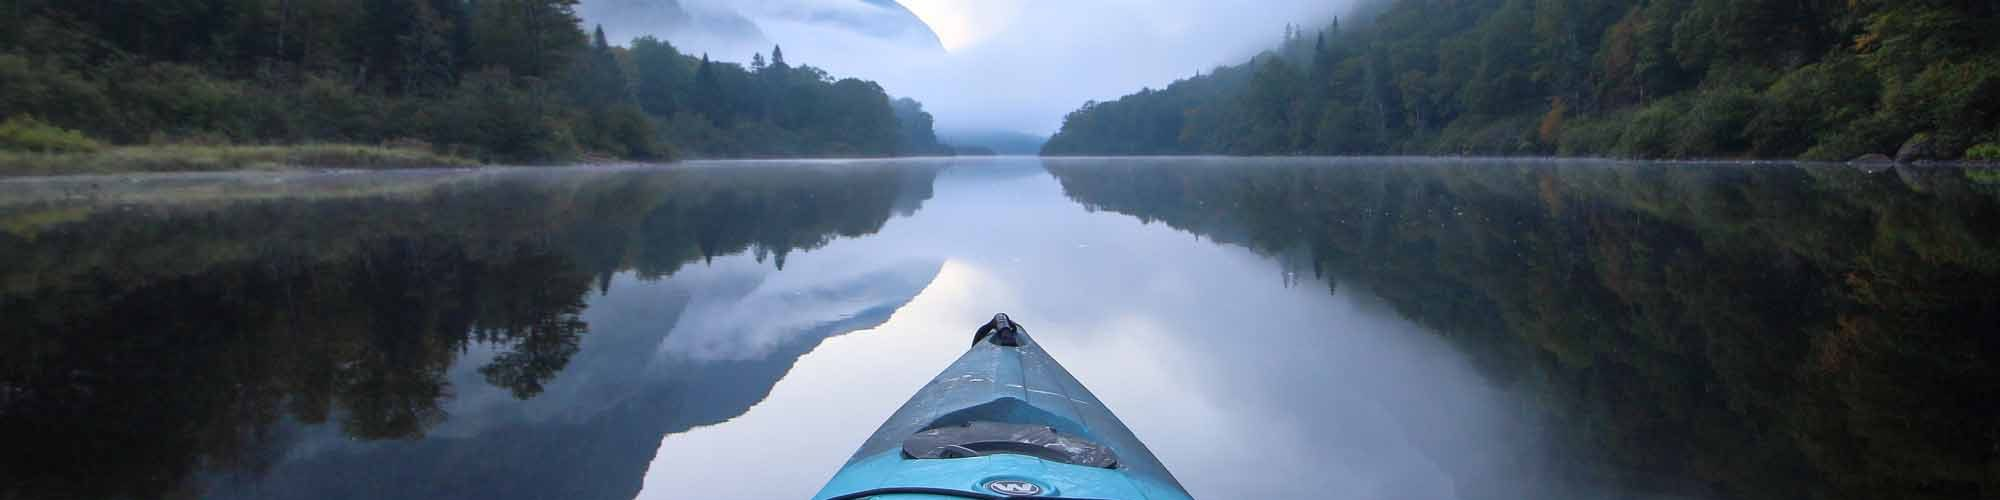 Jacques-Cartier-National-Park-Quebec-MAXIME-LEGARE-VEZINA